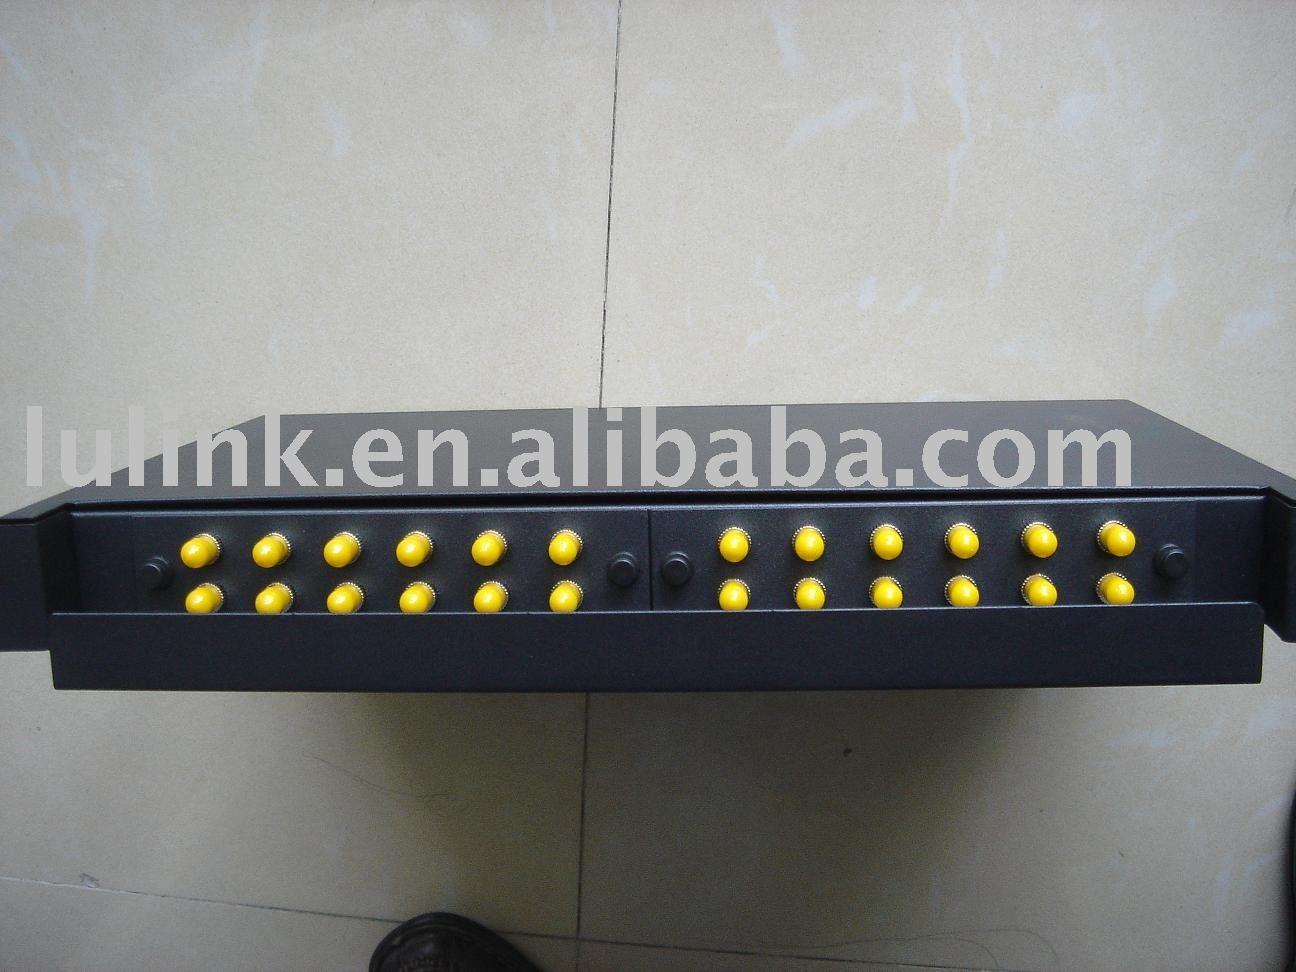 St interfaz de fibra ptica patch panel 24 puertos mm - Patch panel de 24 puertos ...